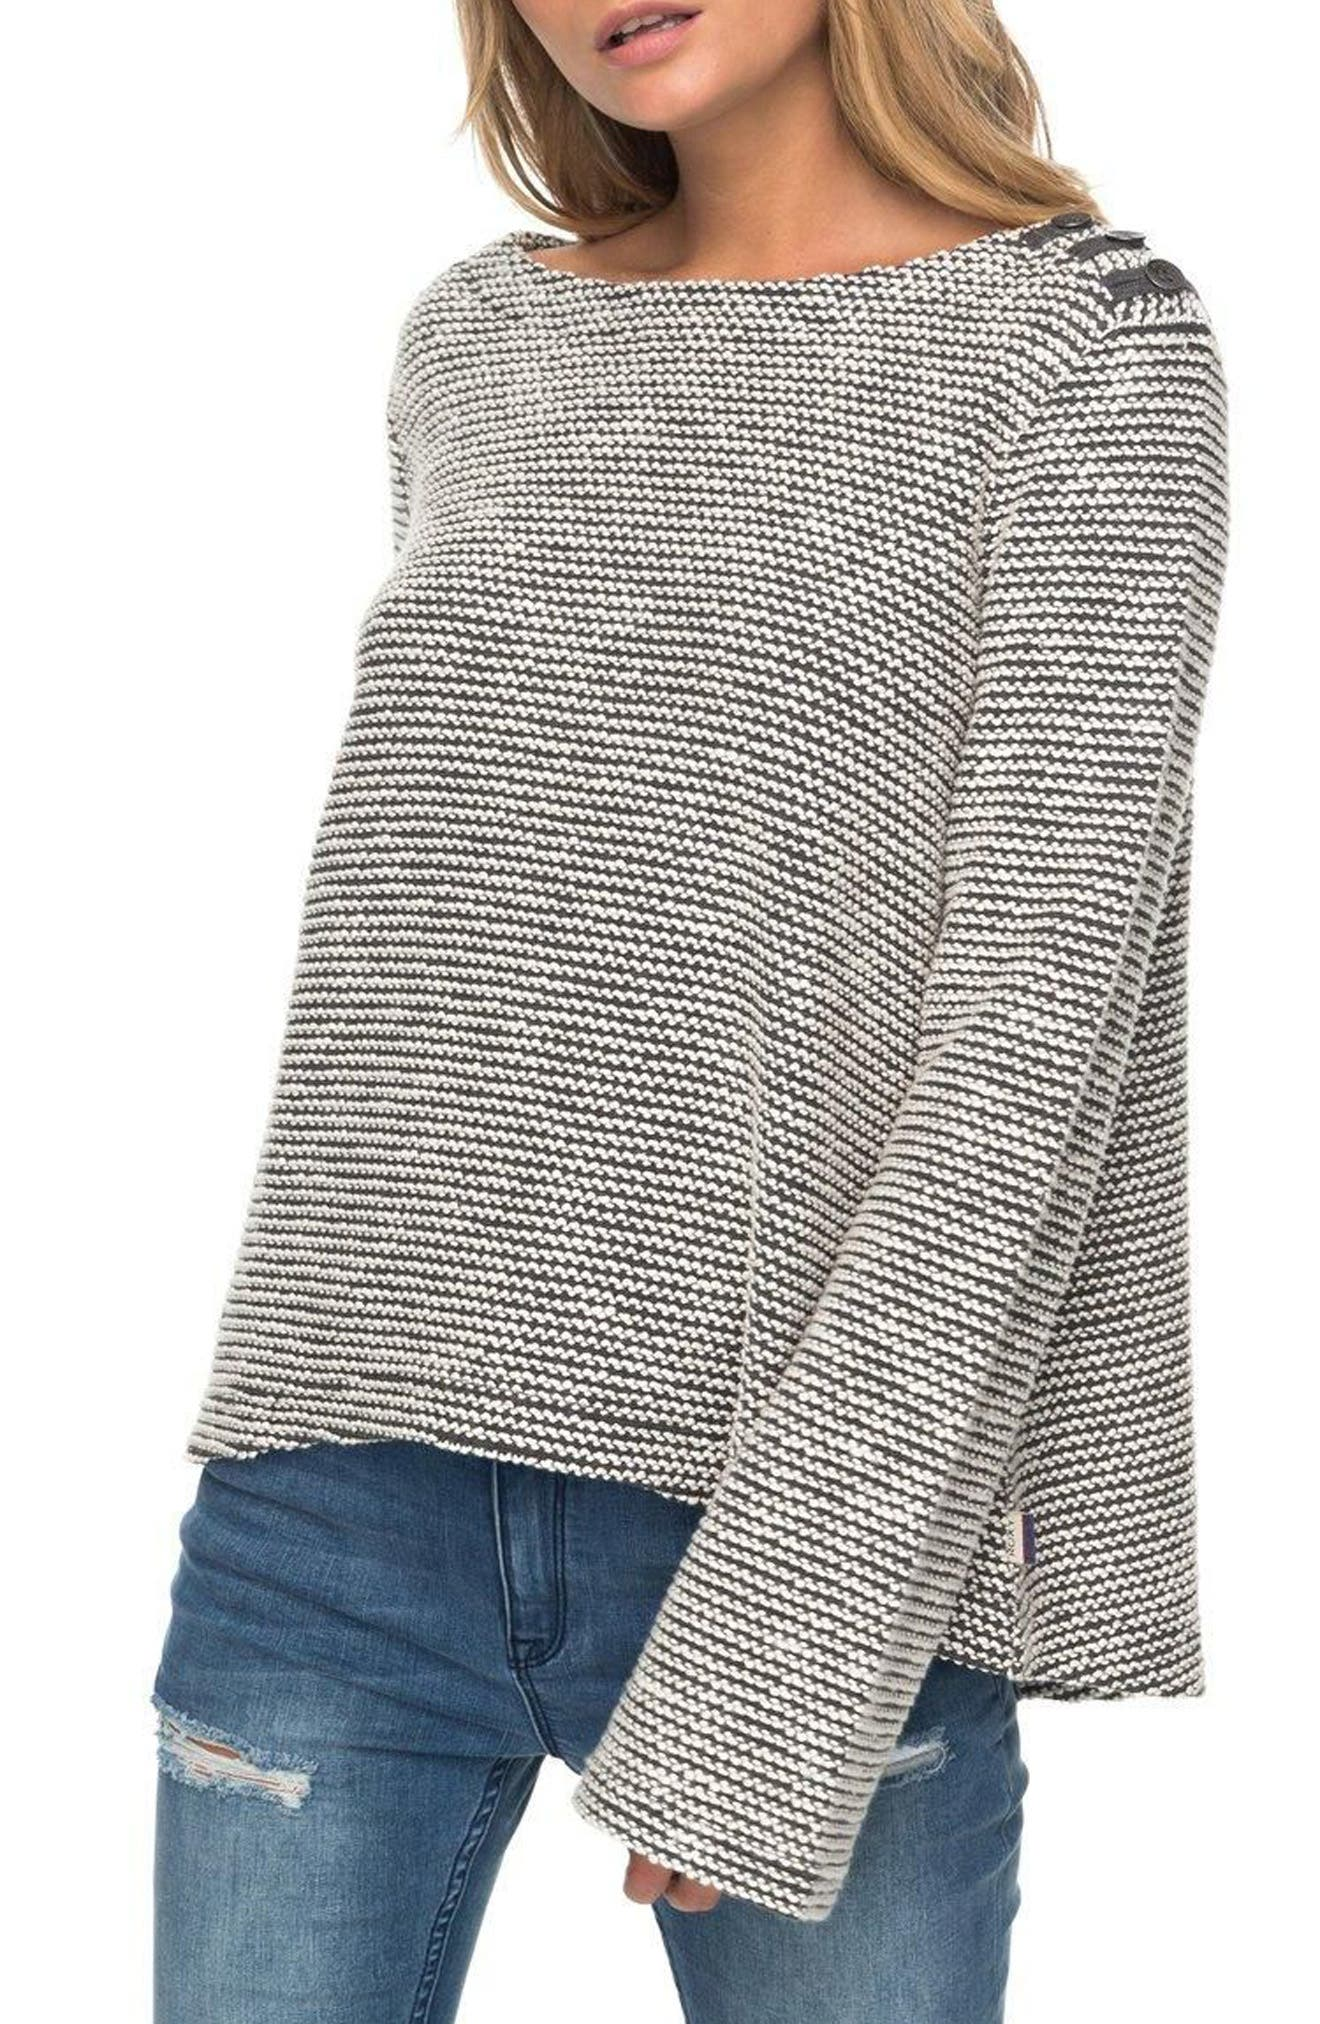 Free Thinking Sweatshirt,                         Main,                         color,